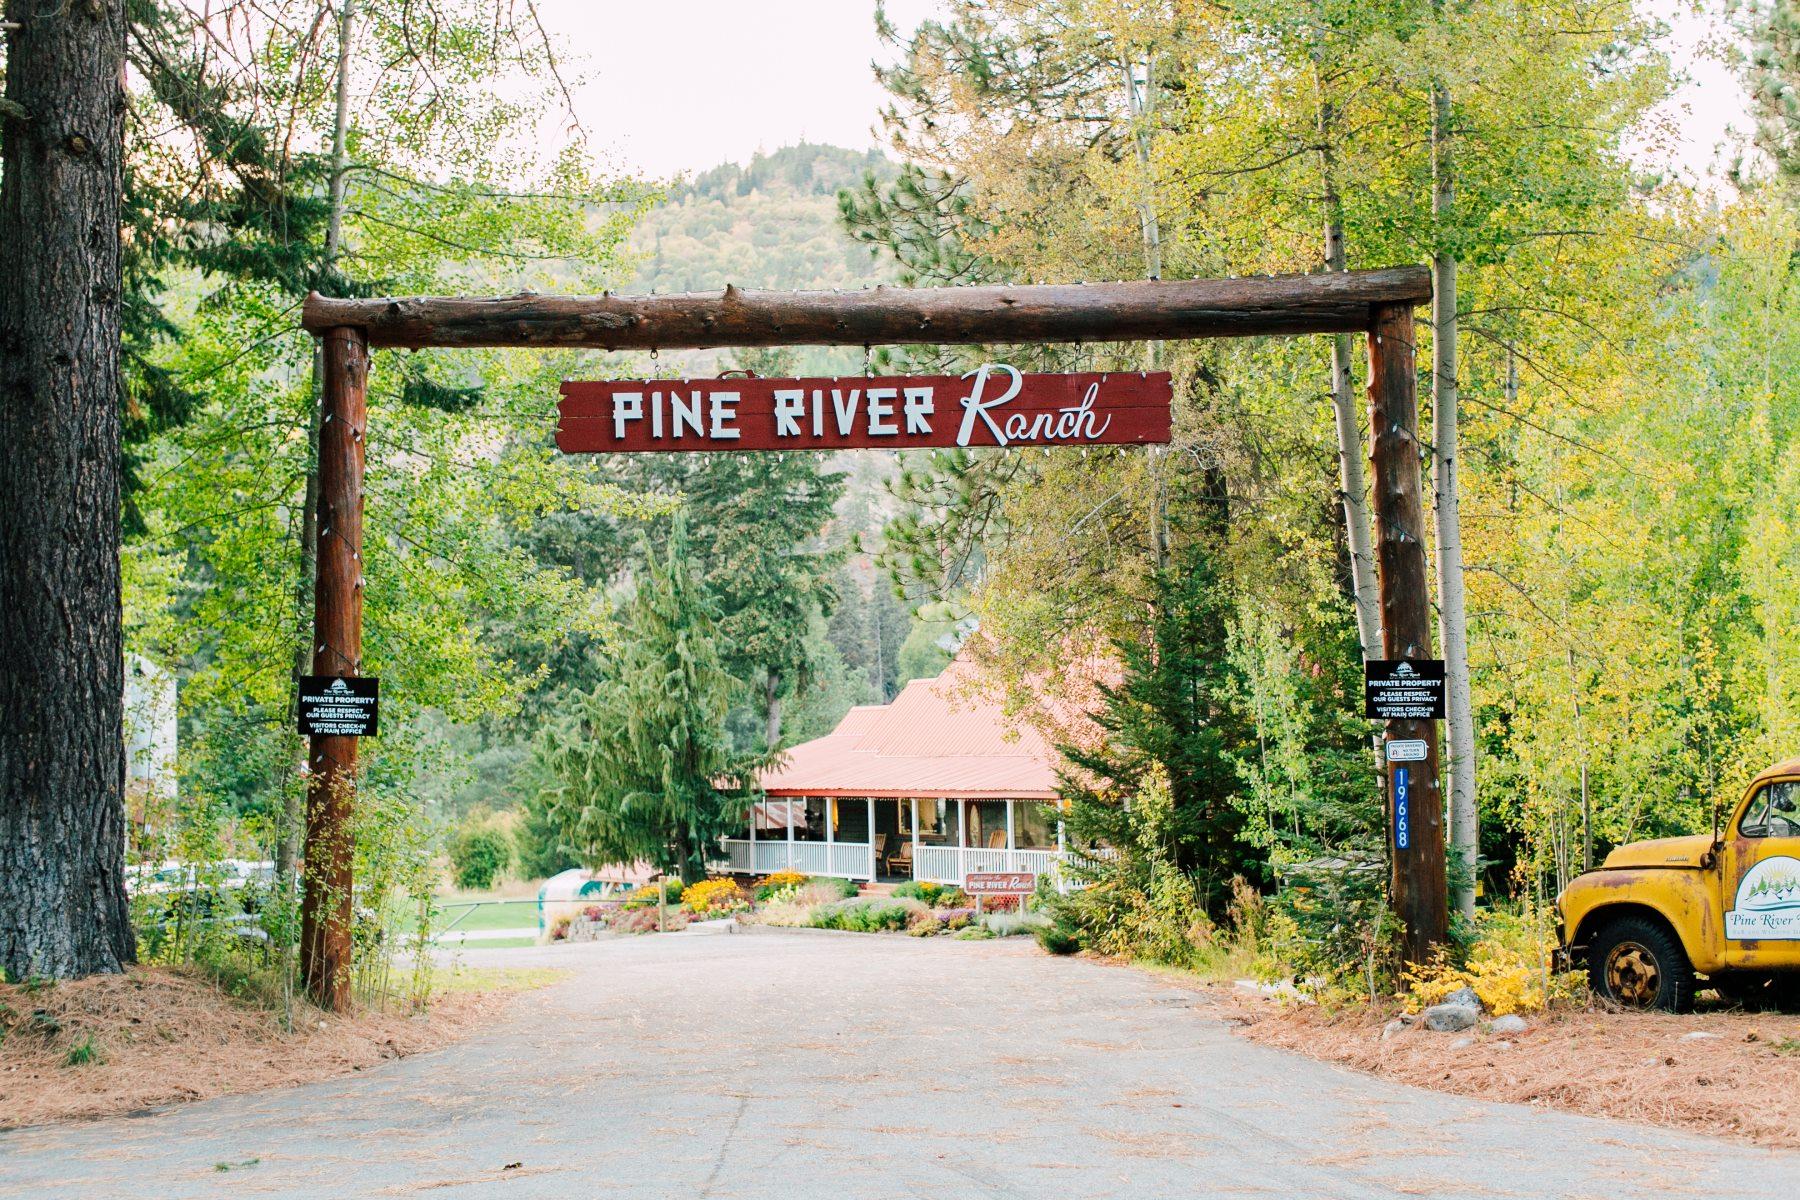 Pine River Ranch Main Entrance